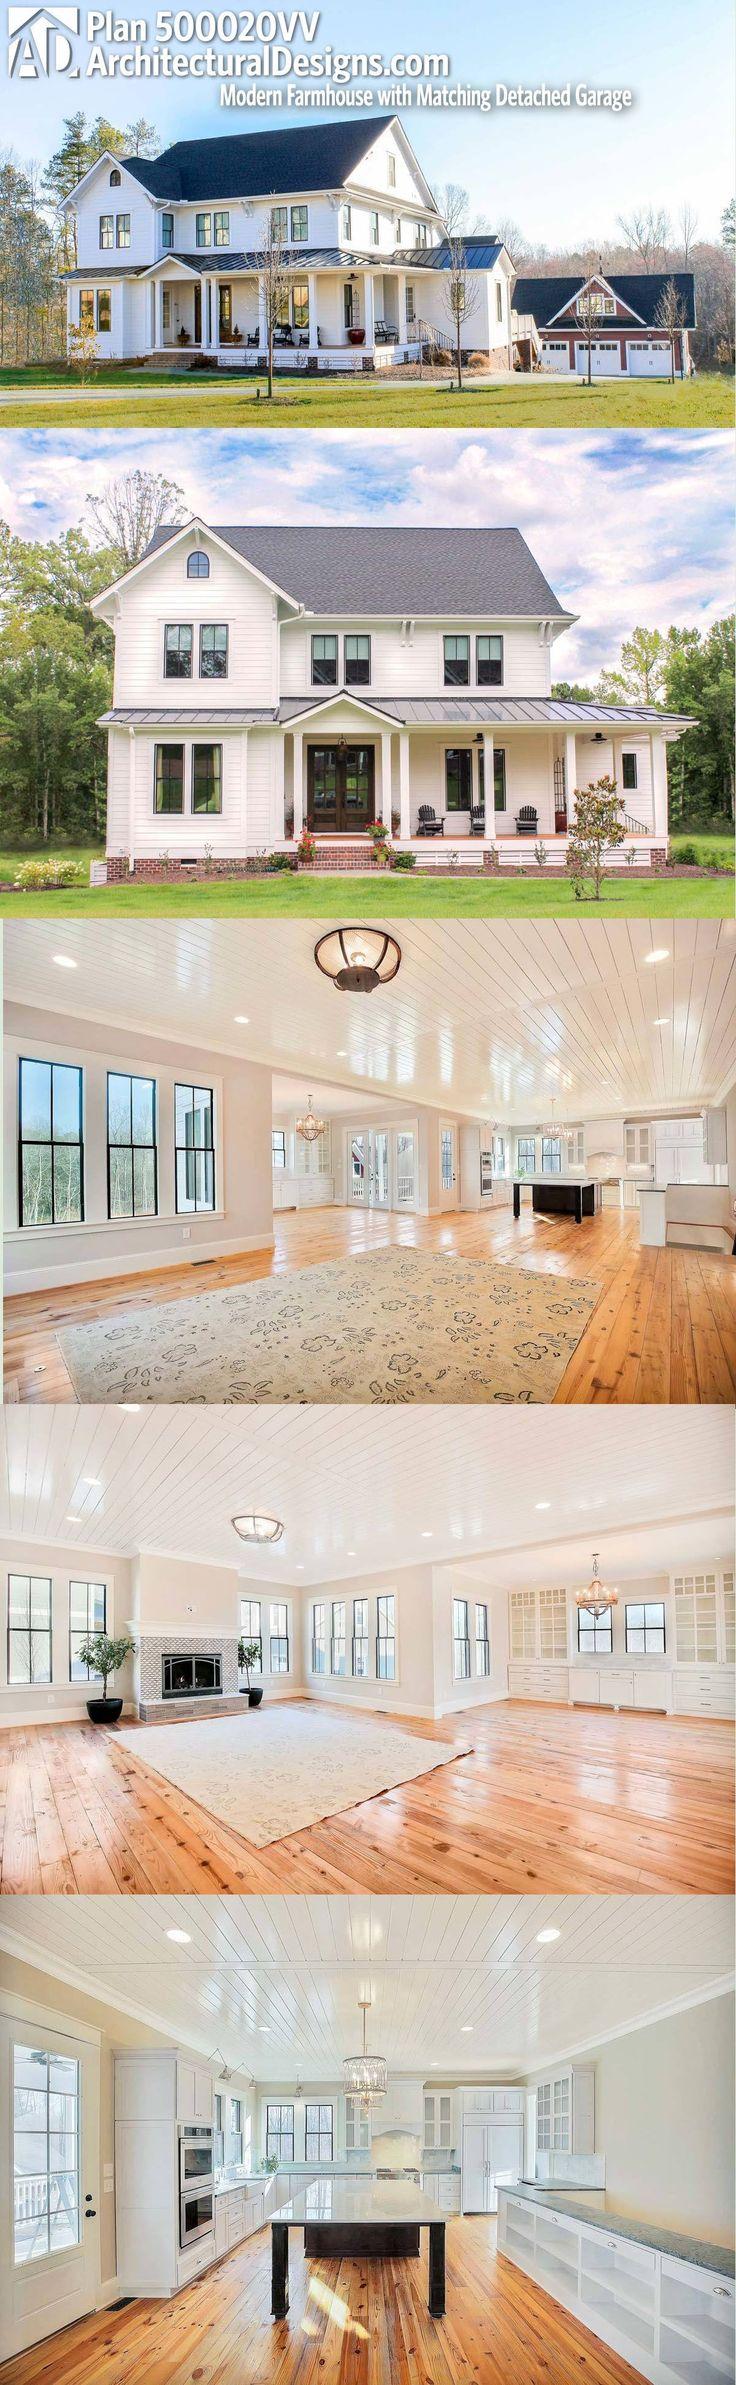 3427 best Modern home images on Pinterest